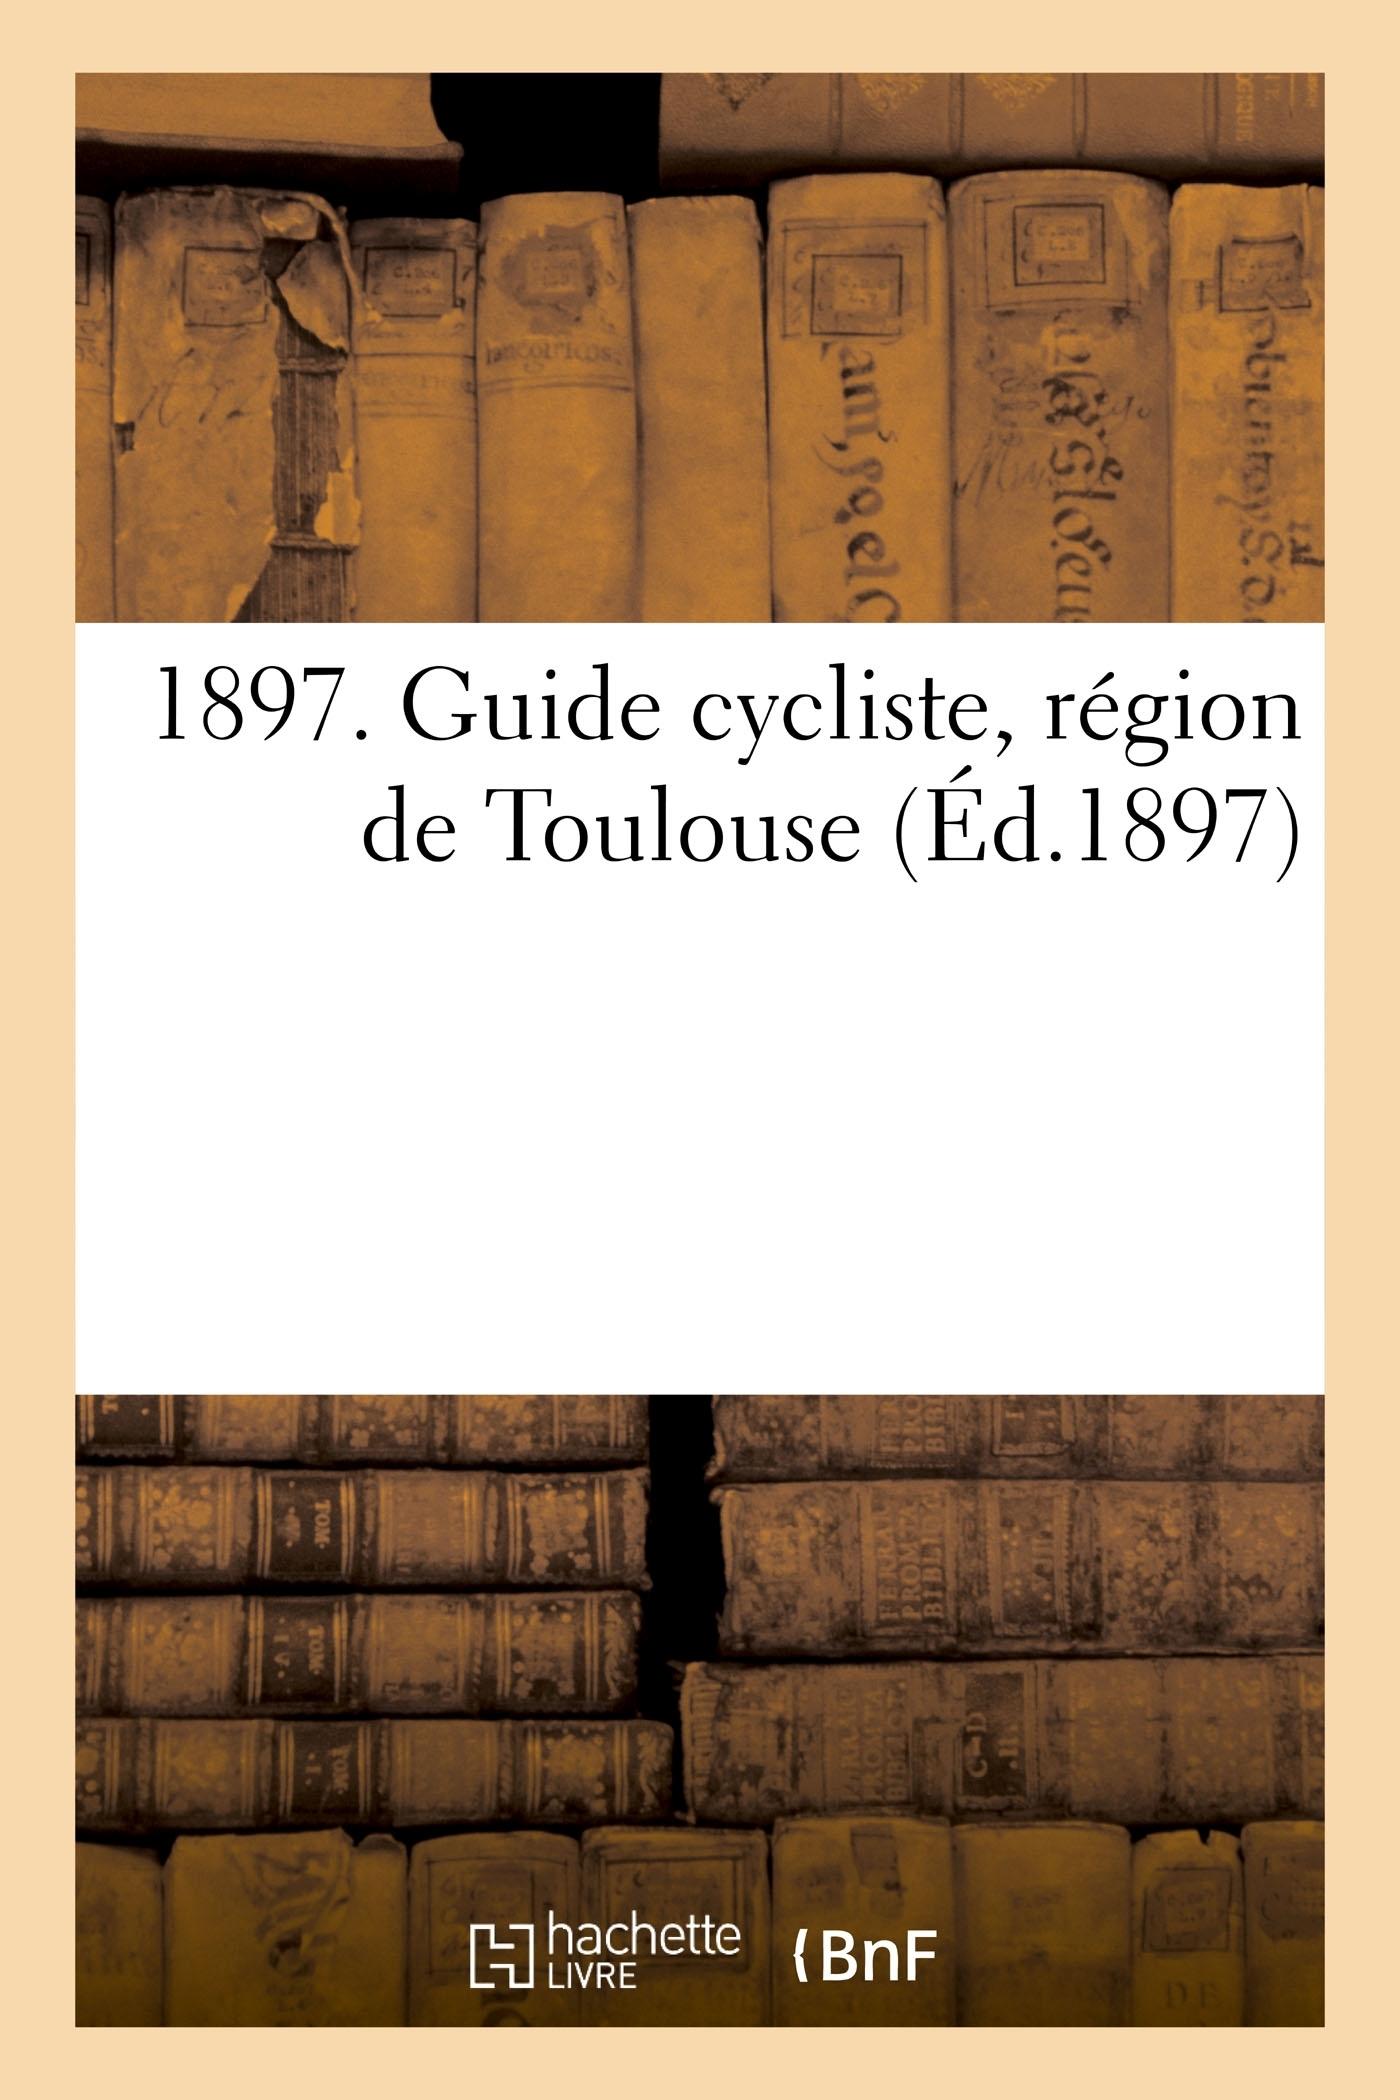 1897. GUIDE CYCLISTE, REGION DE TOULOUSE. MOIS DE CYCLISME, CARTE CYCLISTE, REGLEMENTATION